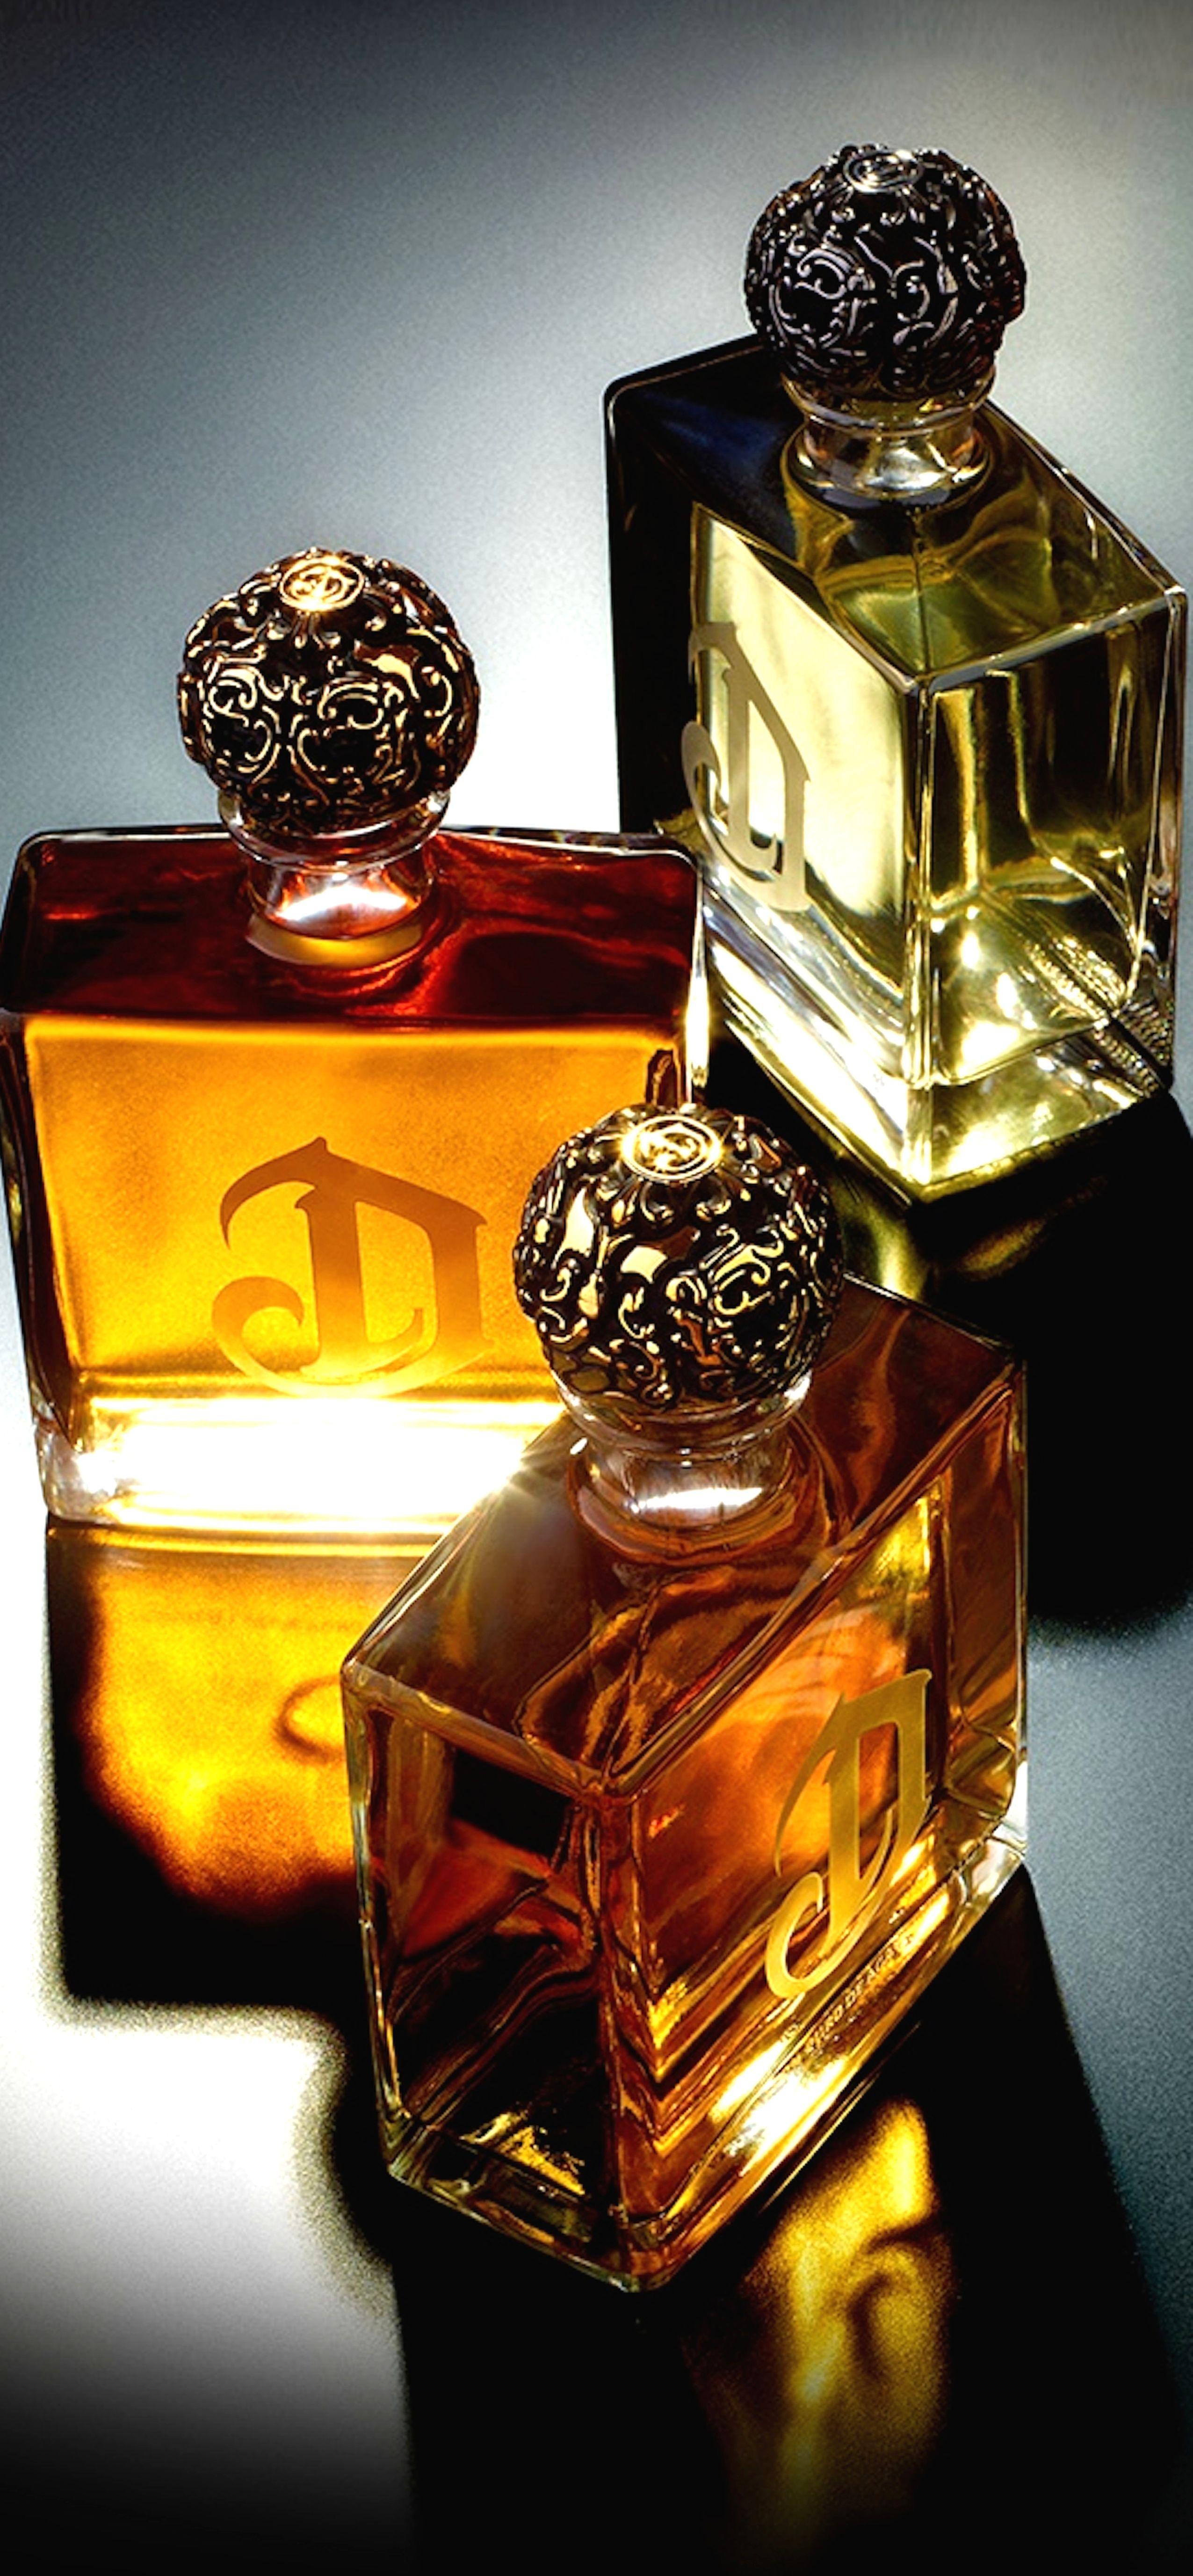 Bottles A ListPerfumeFragrance Perfume TequilaThe Deleón Et DH9IWE2